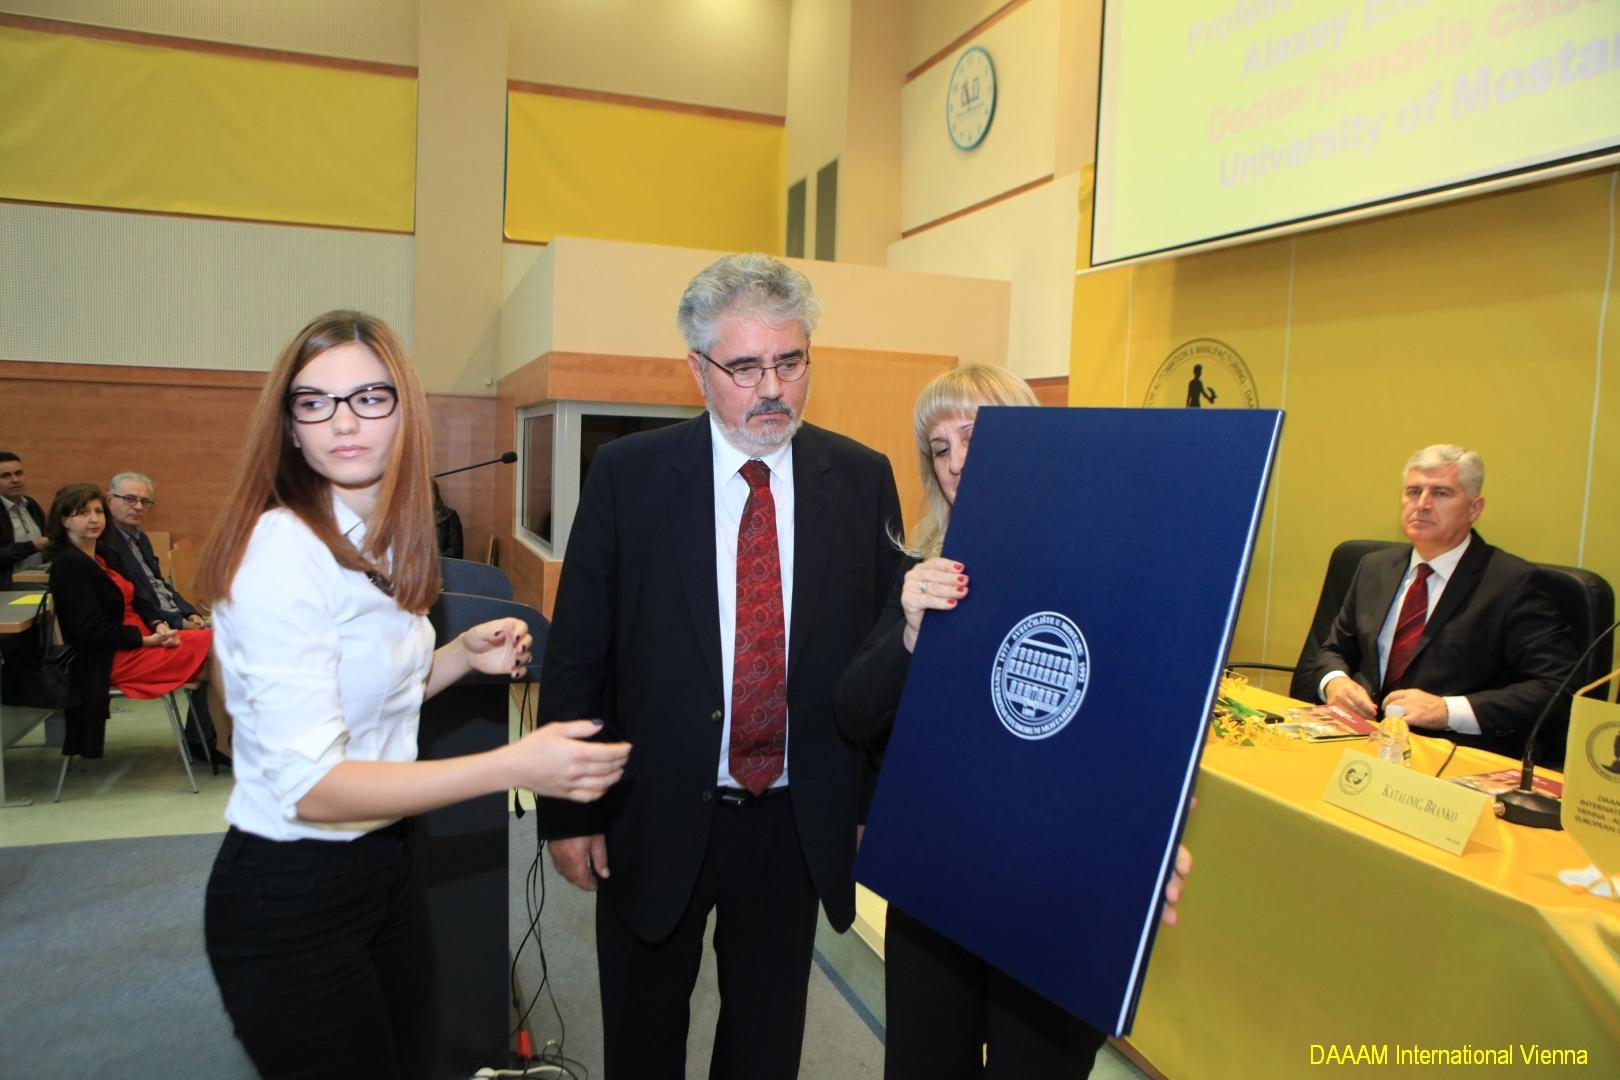 DAAAM_2016_Mostar_06_Professor_and_Cosmonaut_Alexey_Eliseev_Doctor_honors_causa_001